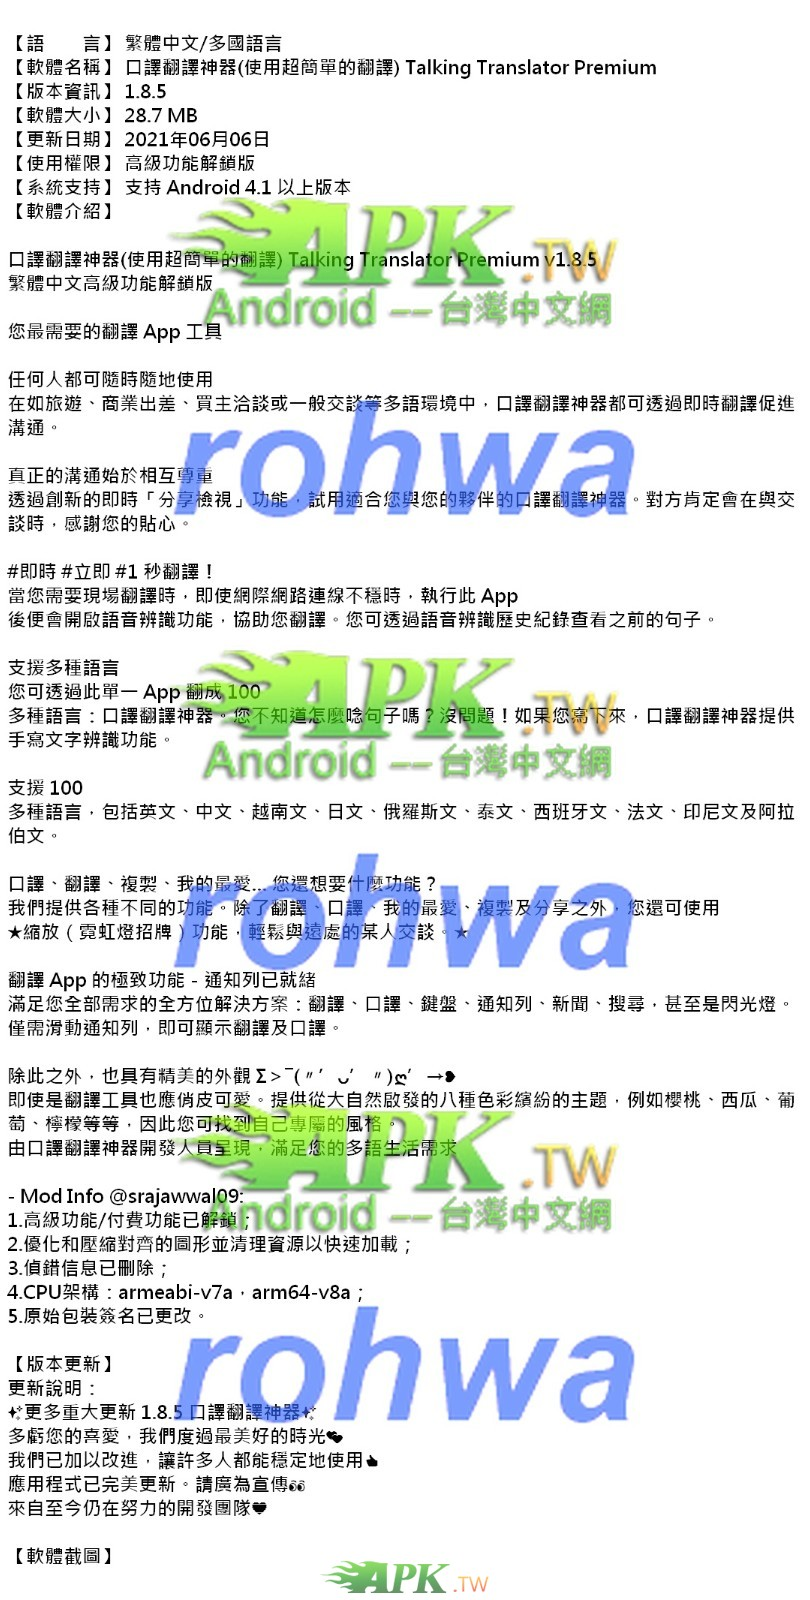 TalkingTranslator_Premium_1.8.5_.jpg